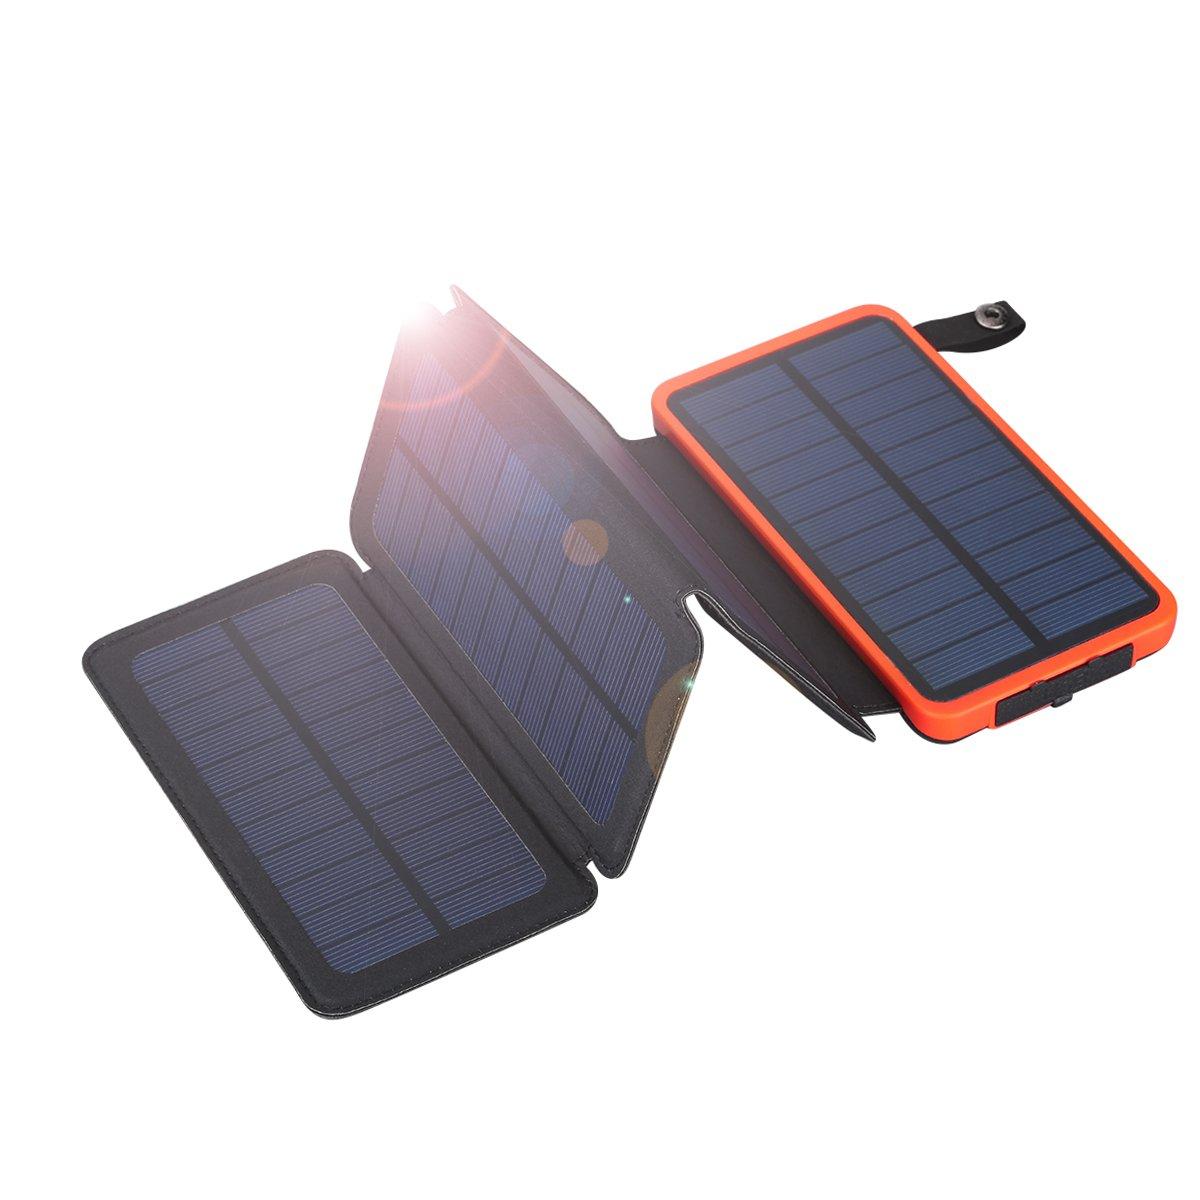 FLOUREON 10,000mAh Solar Charger Power Bank with 1+3PCS Solar Panels Portable Solar Powered Phone Charger IP67 Waterproof LED SOS Flashlight (Orange)